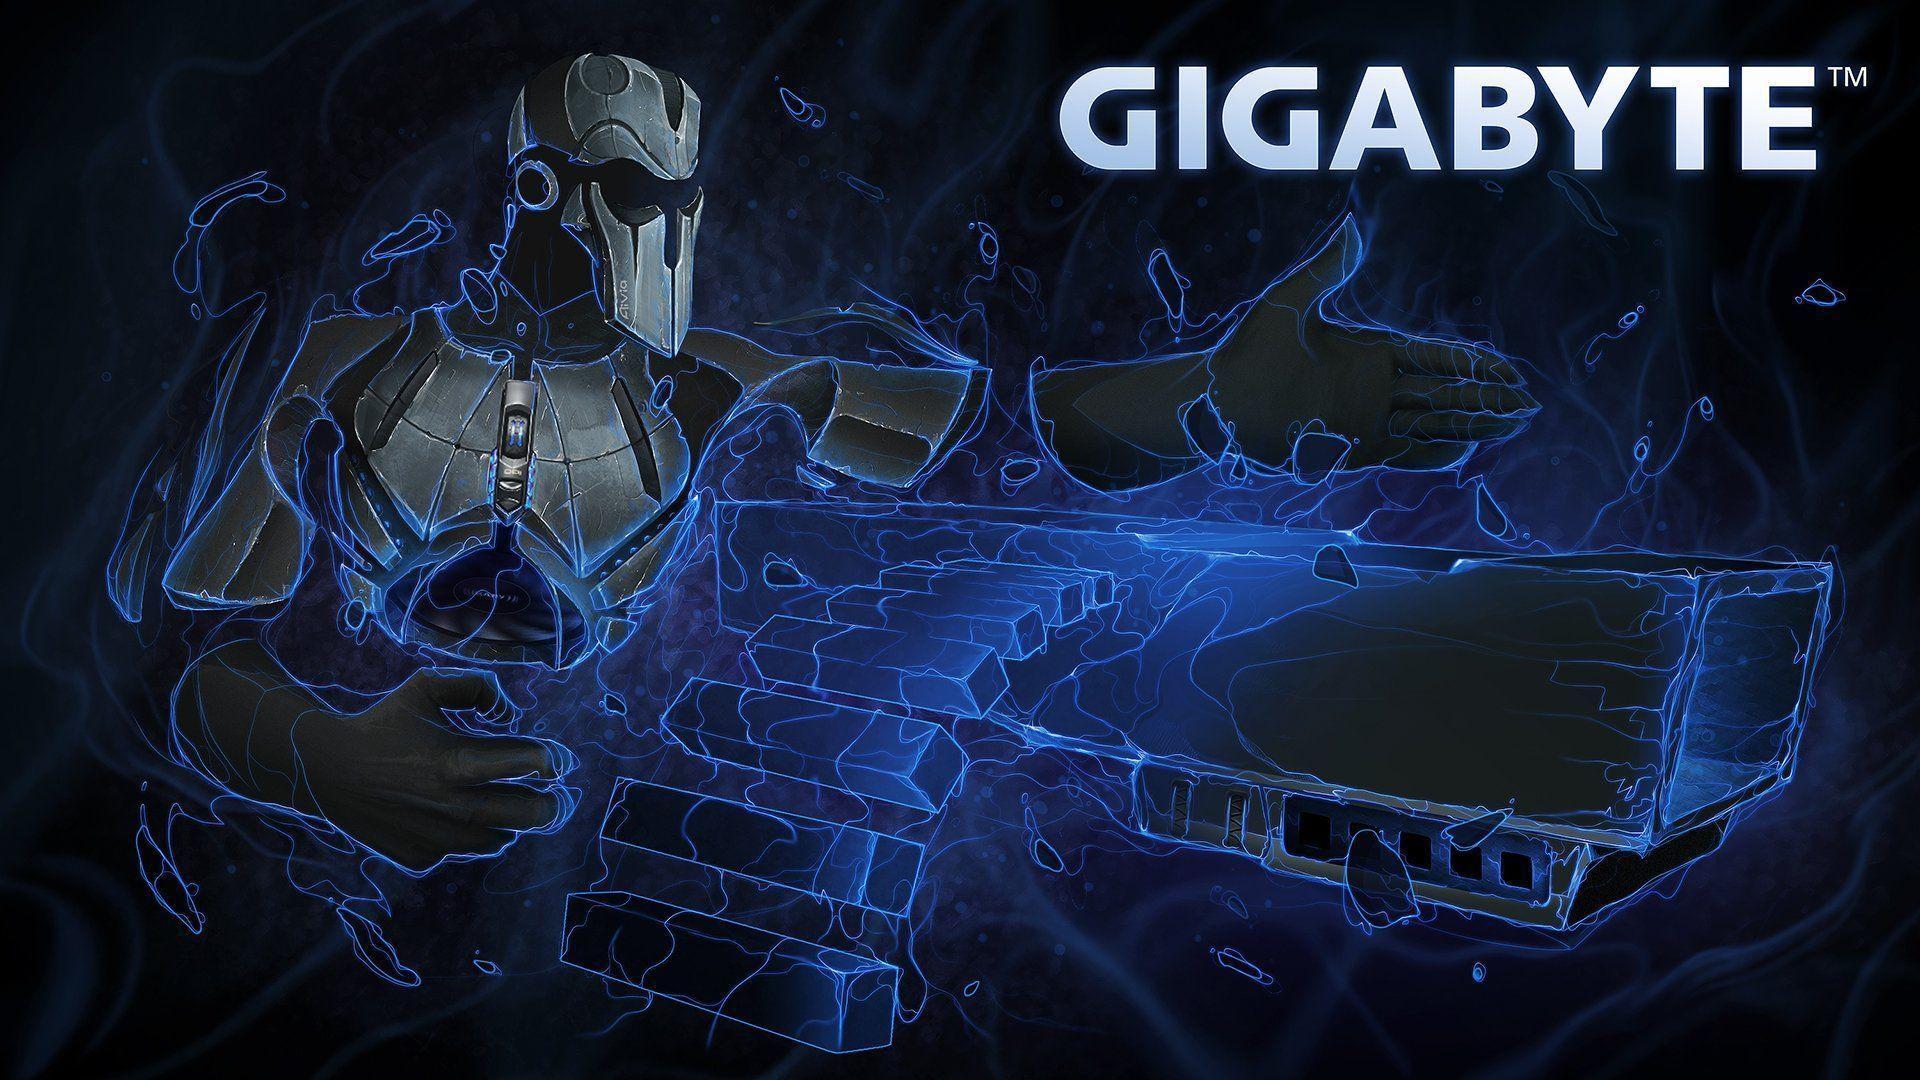 nvidia intel gigabyte wallpaper - photo #26